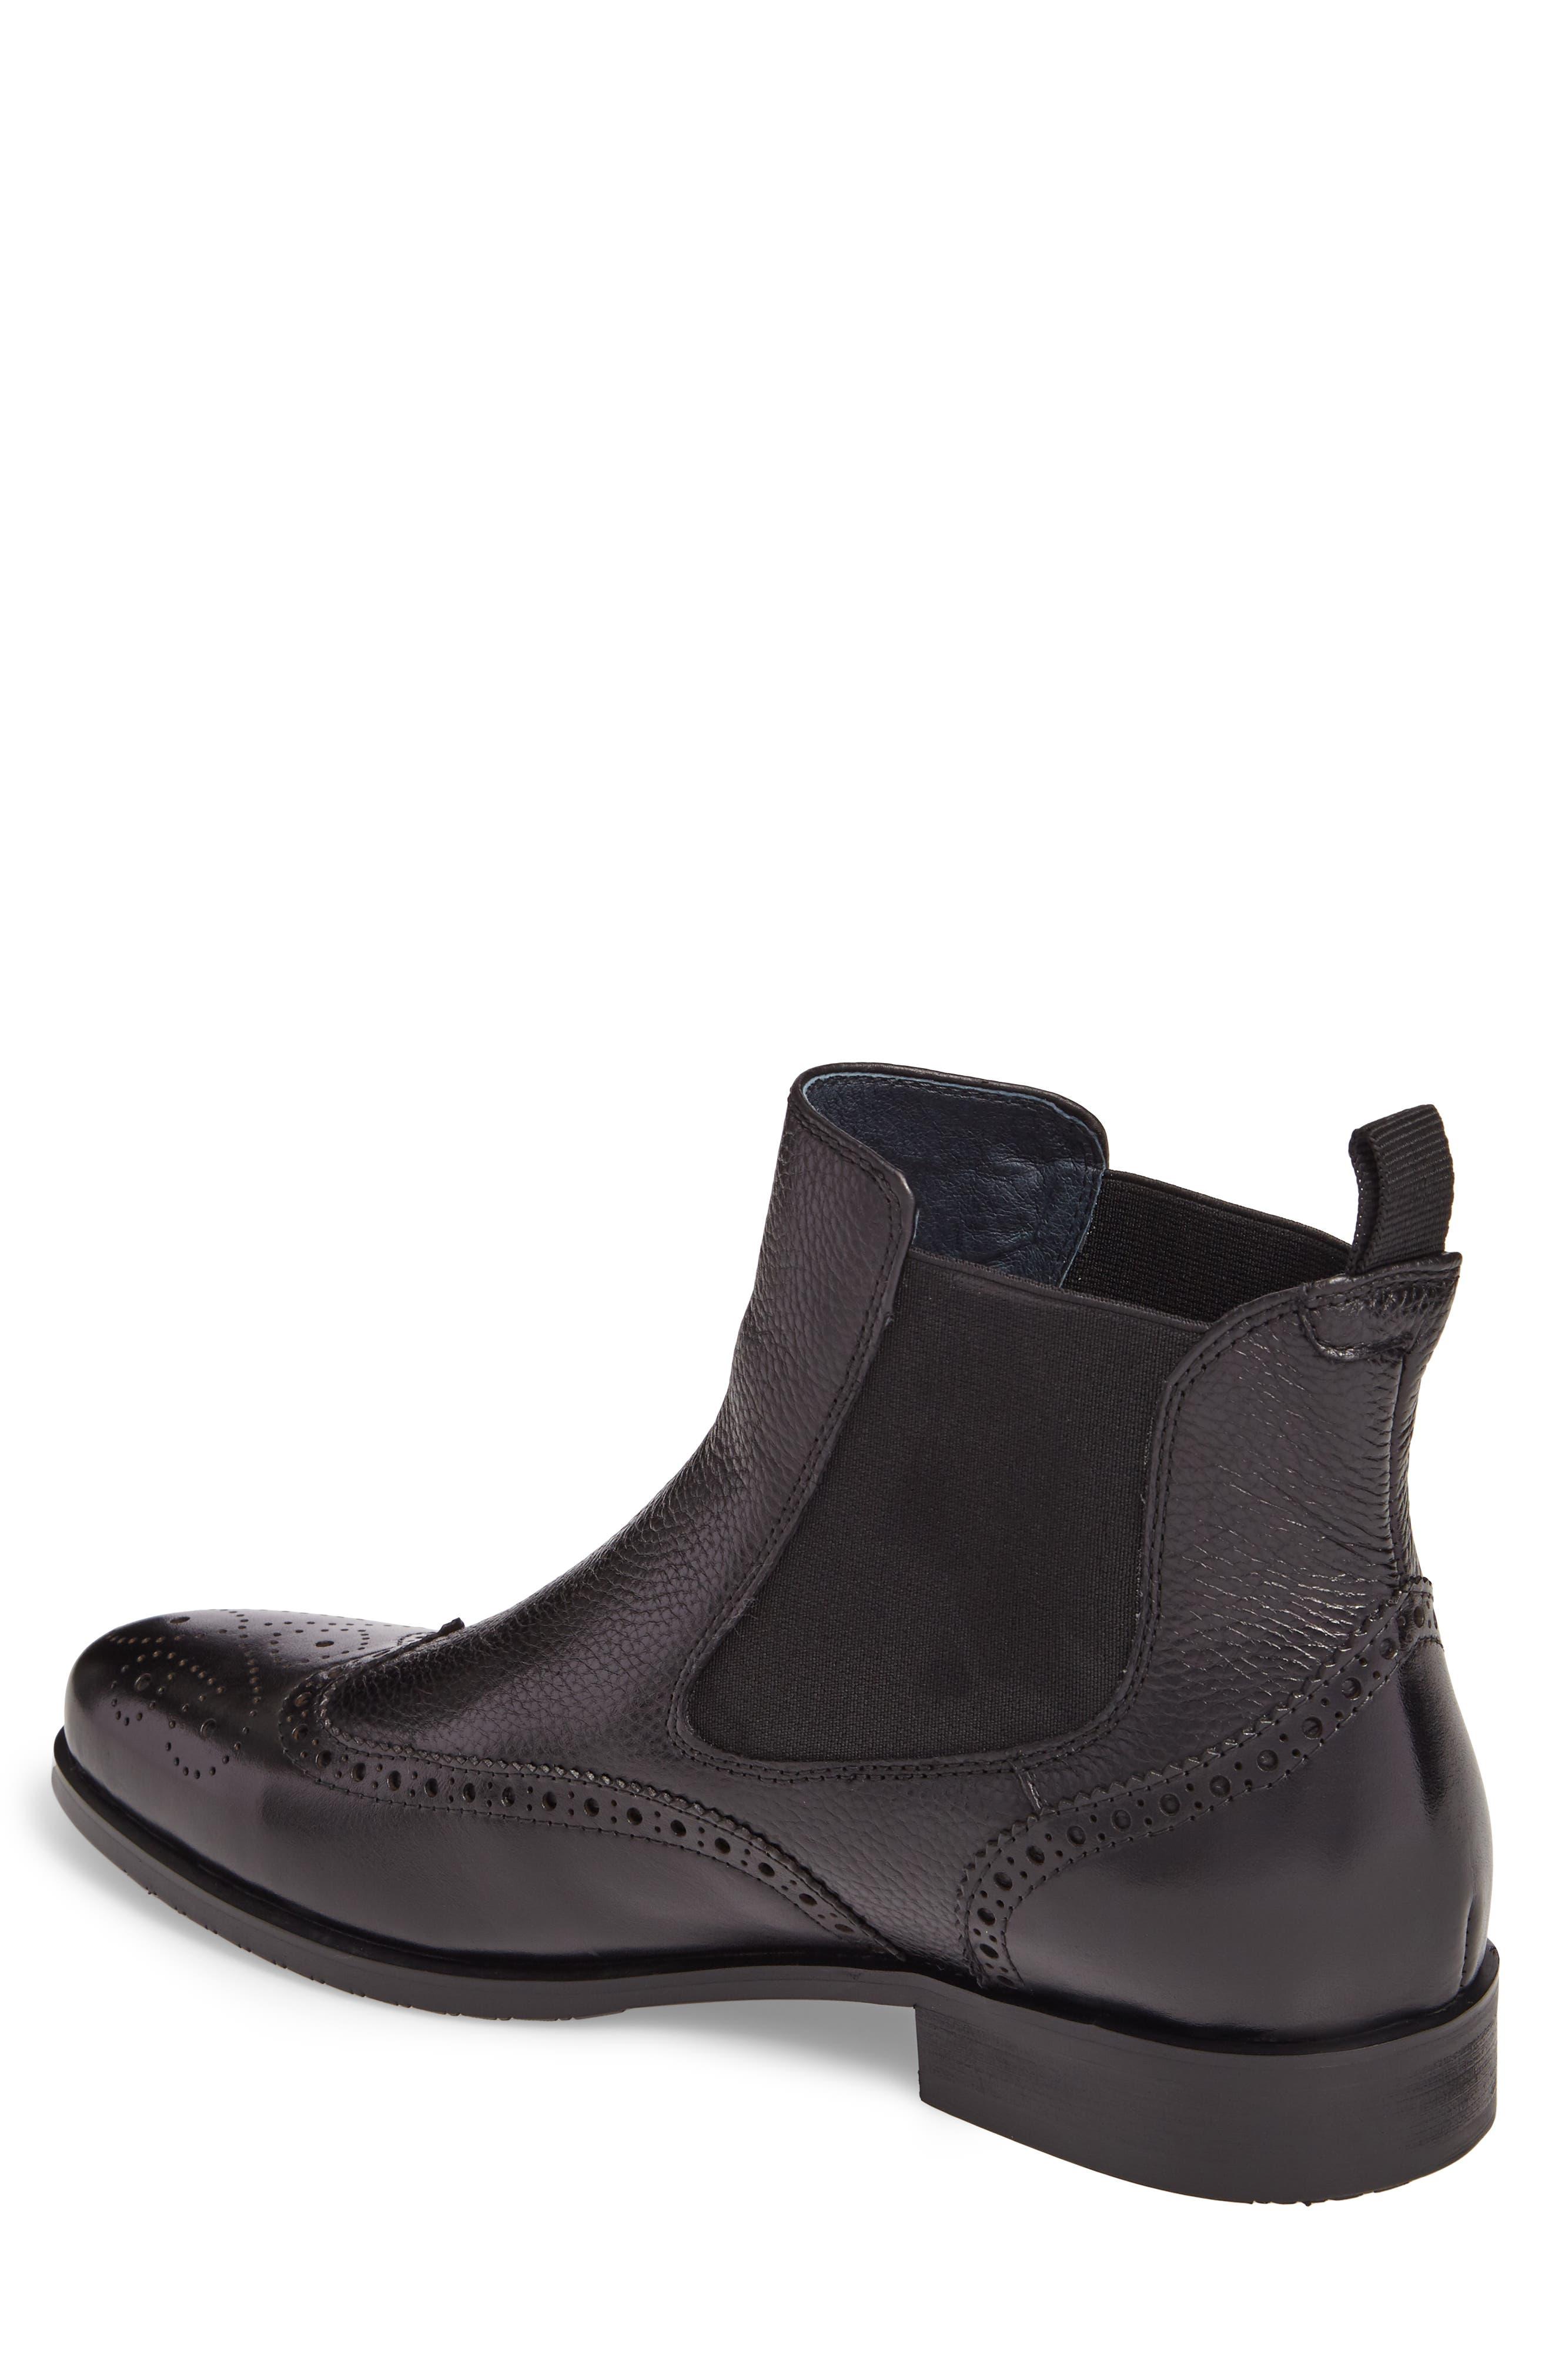 Hamel Chelsea Boot,                             Alternate thumbnail 2, color,                             Black Leather